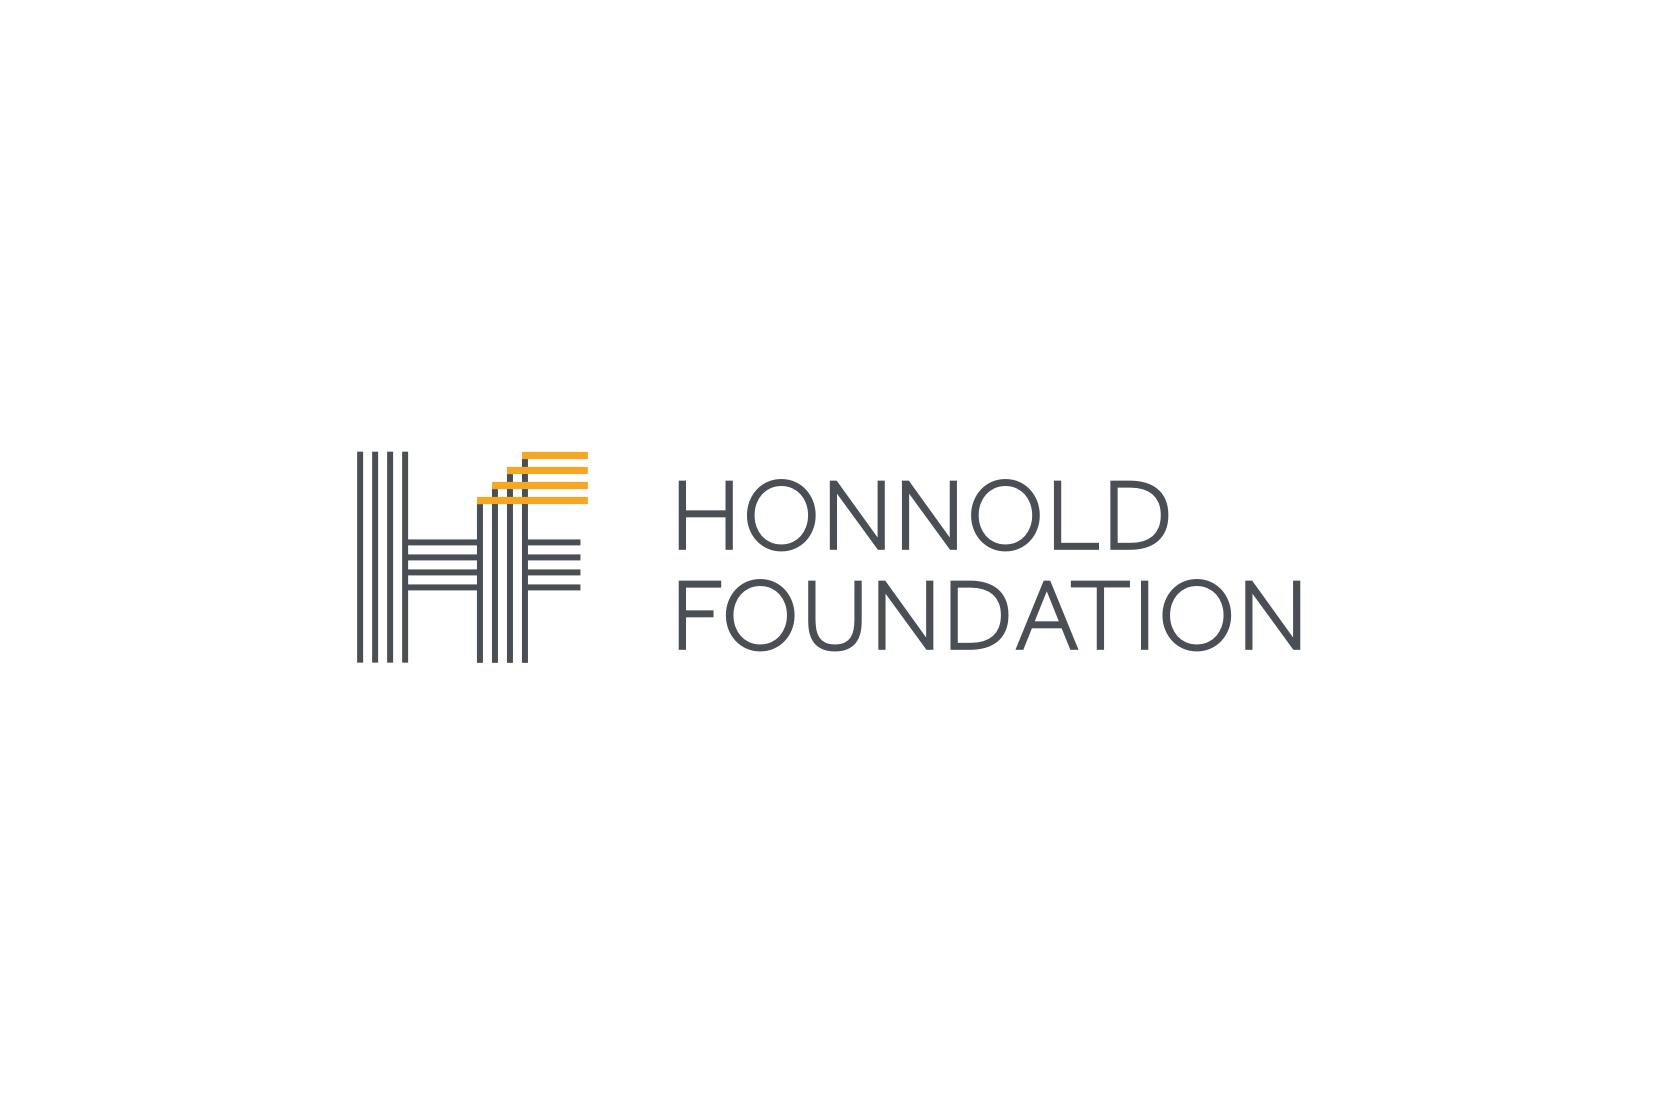 Honnold Foundation.jpg